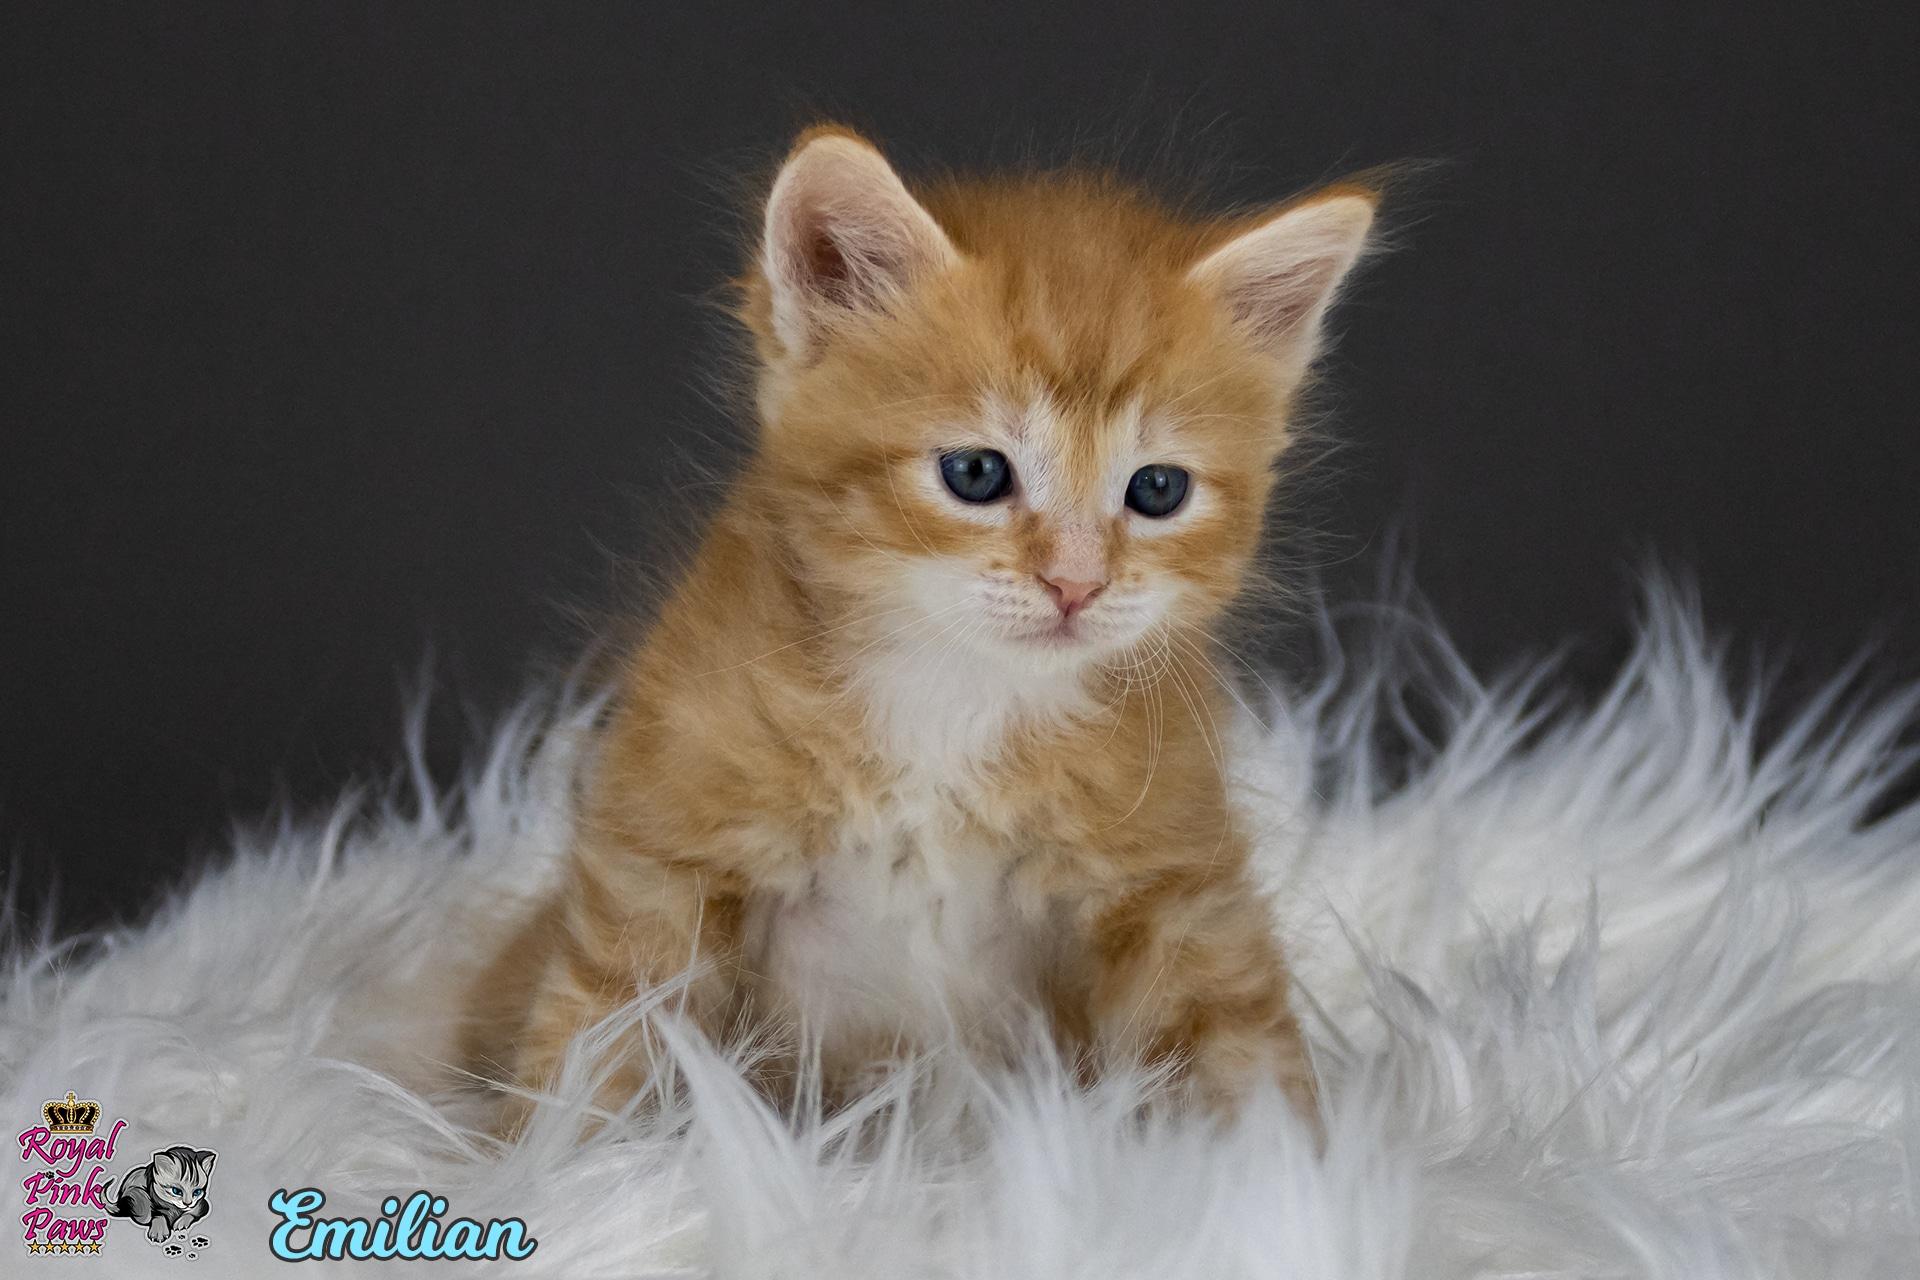 Sibirische Katze - Emilian Royal Pink Paws